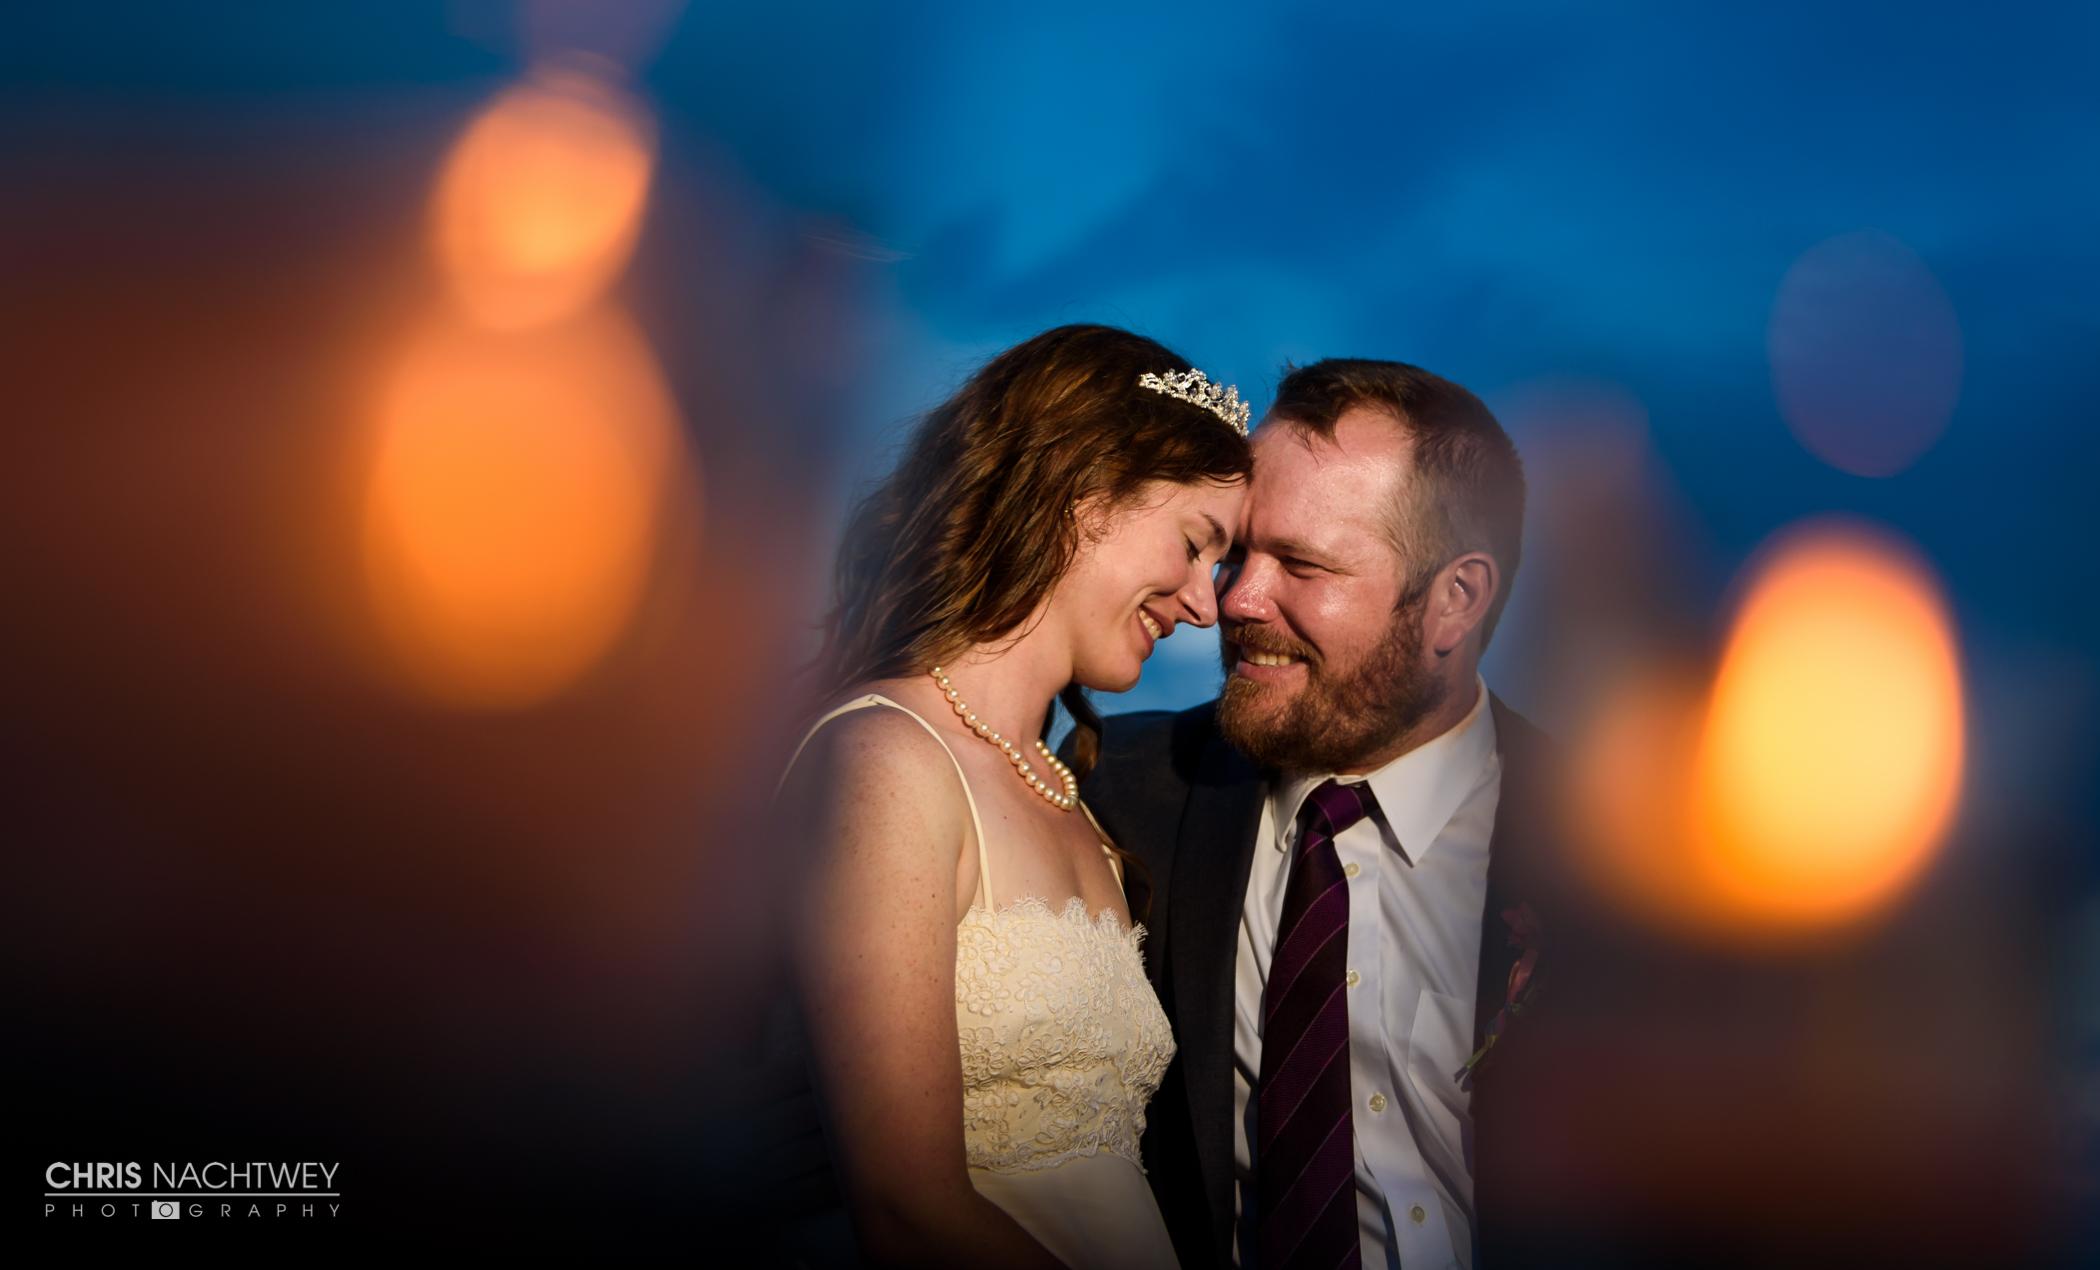 wedding-photographers-mystic-connecticut-chris-nachtwey-2016.jpg